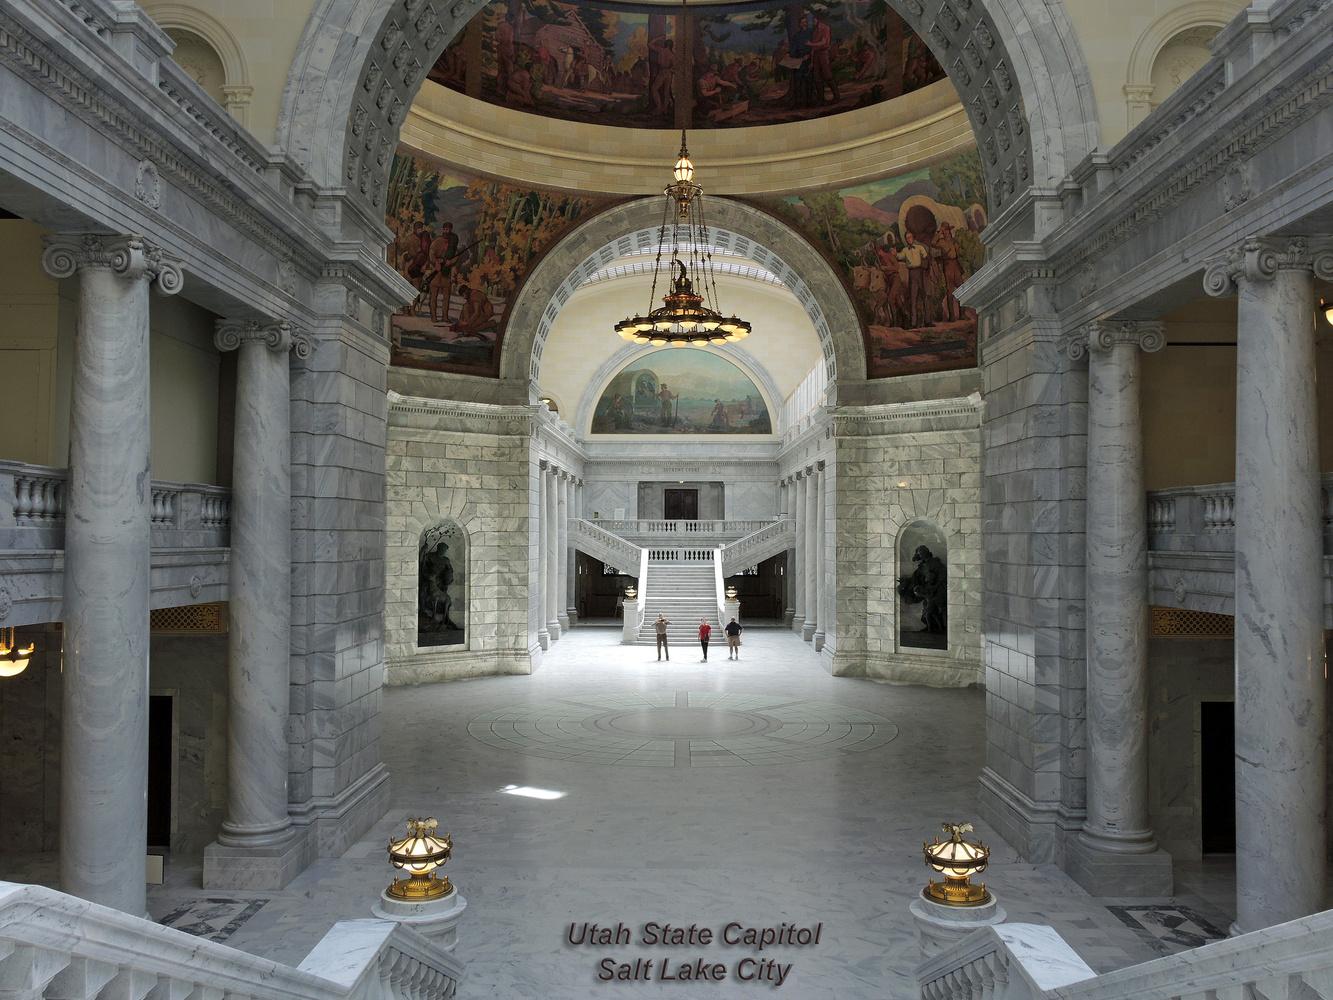 Interior, Utah State Capitol, Salt Lake City, Utah by Charles Haacker